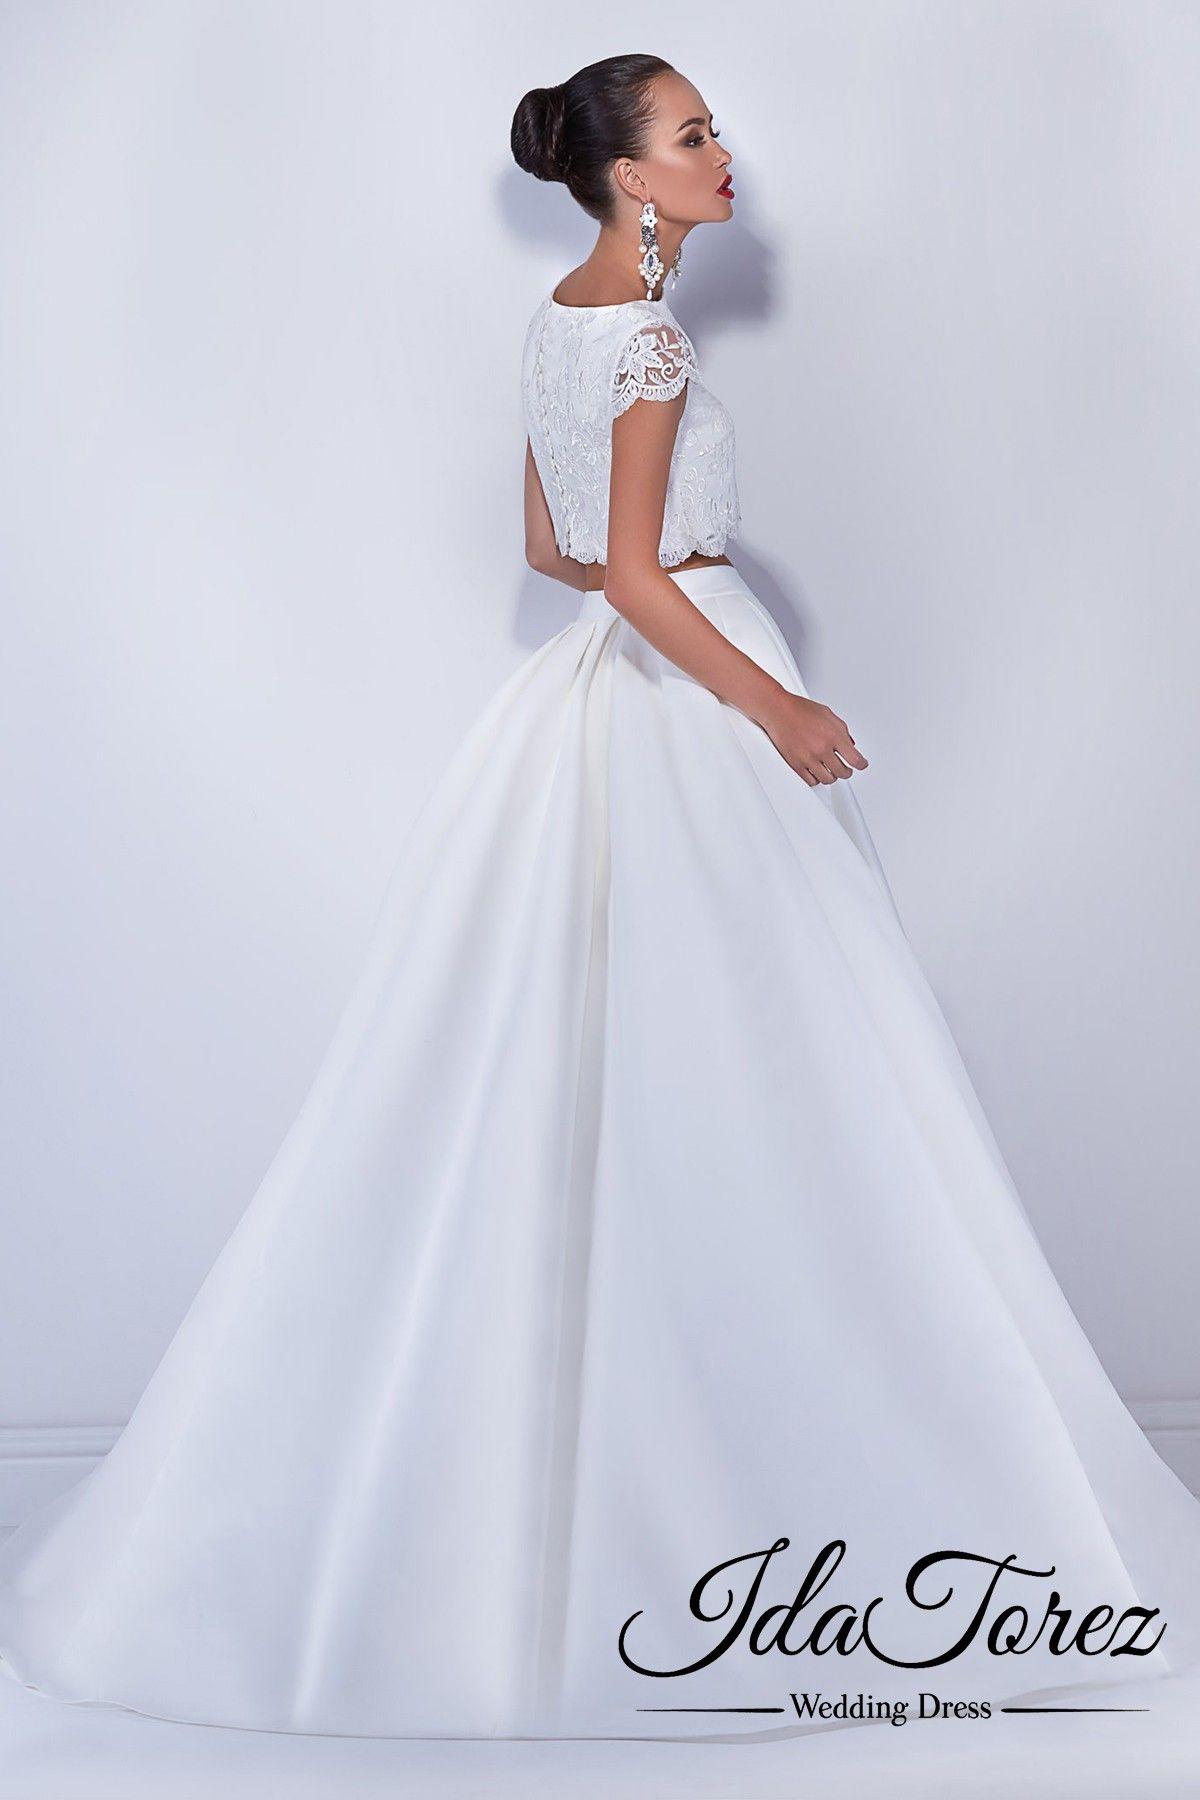 334b1a7e372fb8 Divine Crop top Bateau Natural Court Train Luxuriant Satin Ivory Cap Sleeve  Buttons Wedding Dress 01042